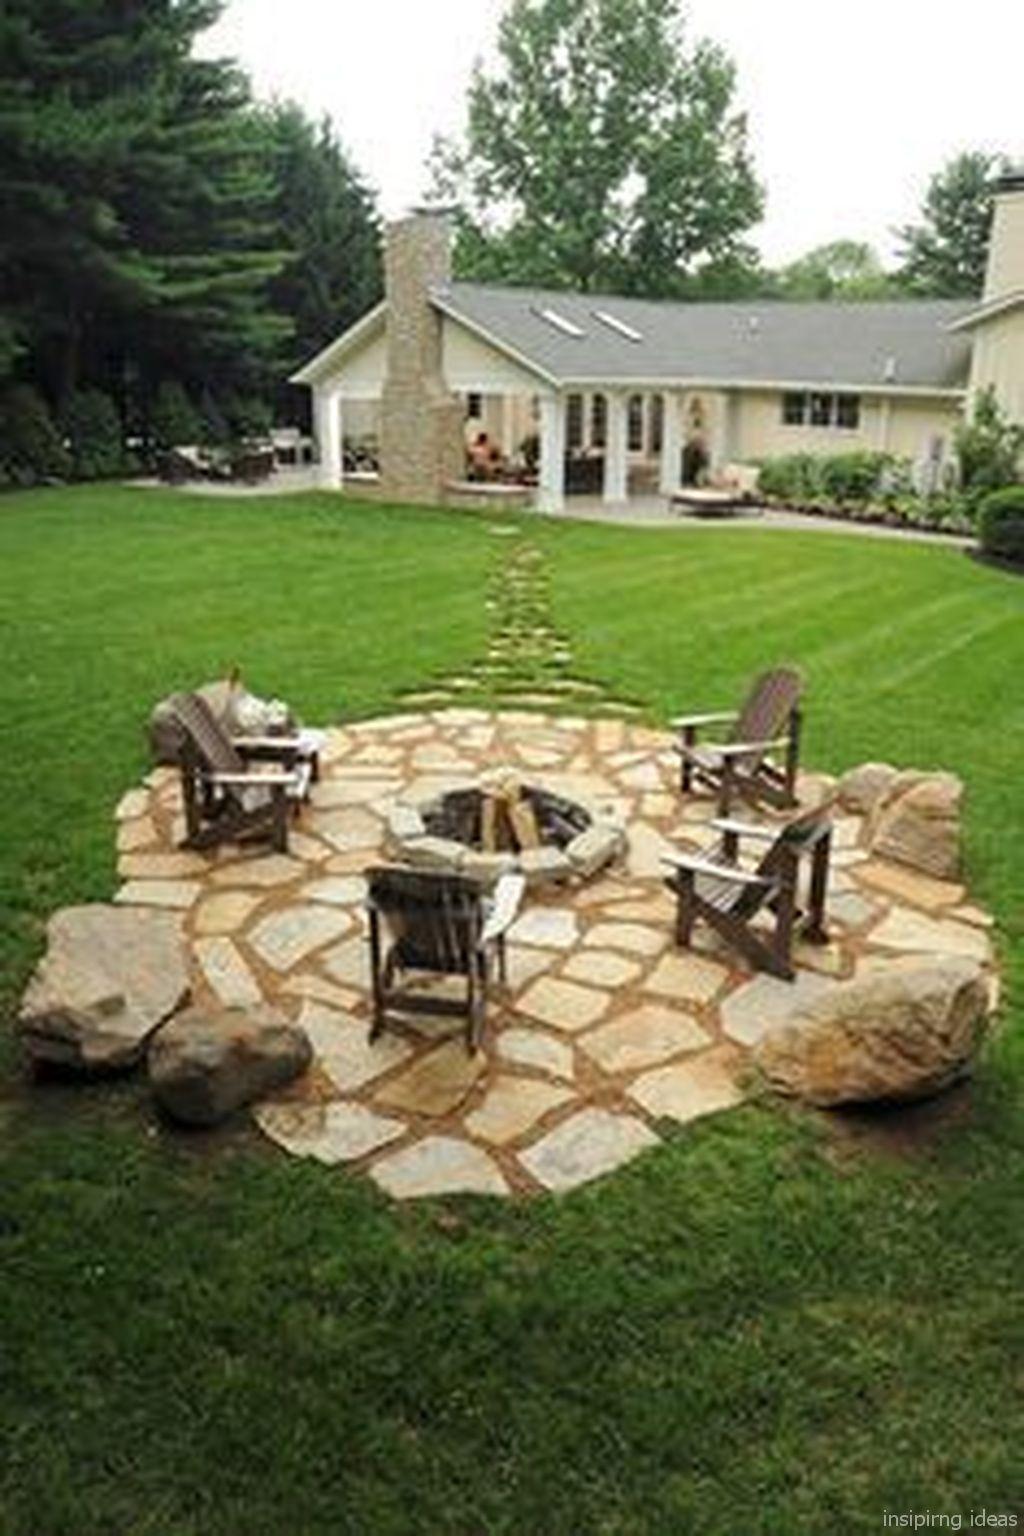 100+ Awesome backyard Fire Pits Ideas 02 - 100+ Awesome Backyard Fire Pits Ideas Outdoor Ideas For The House